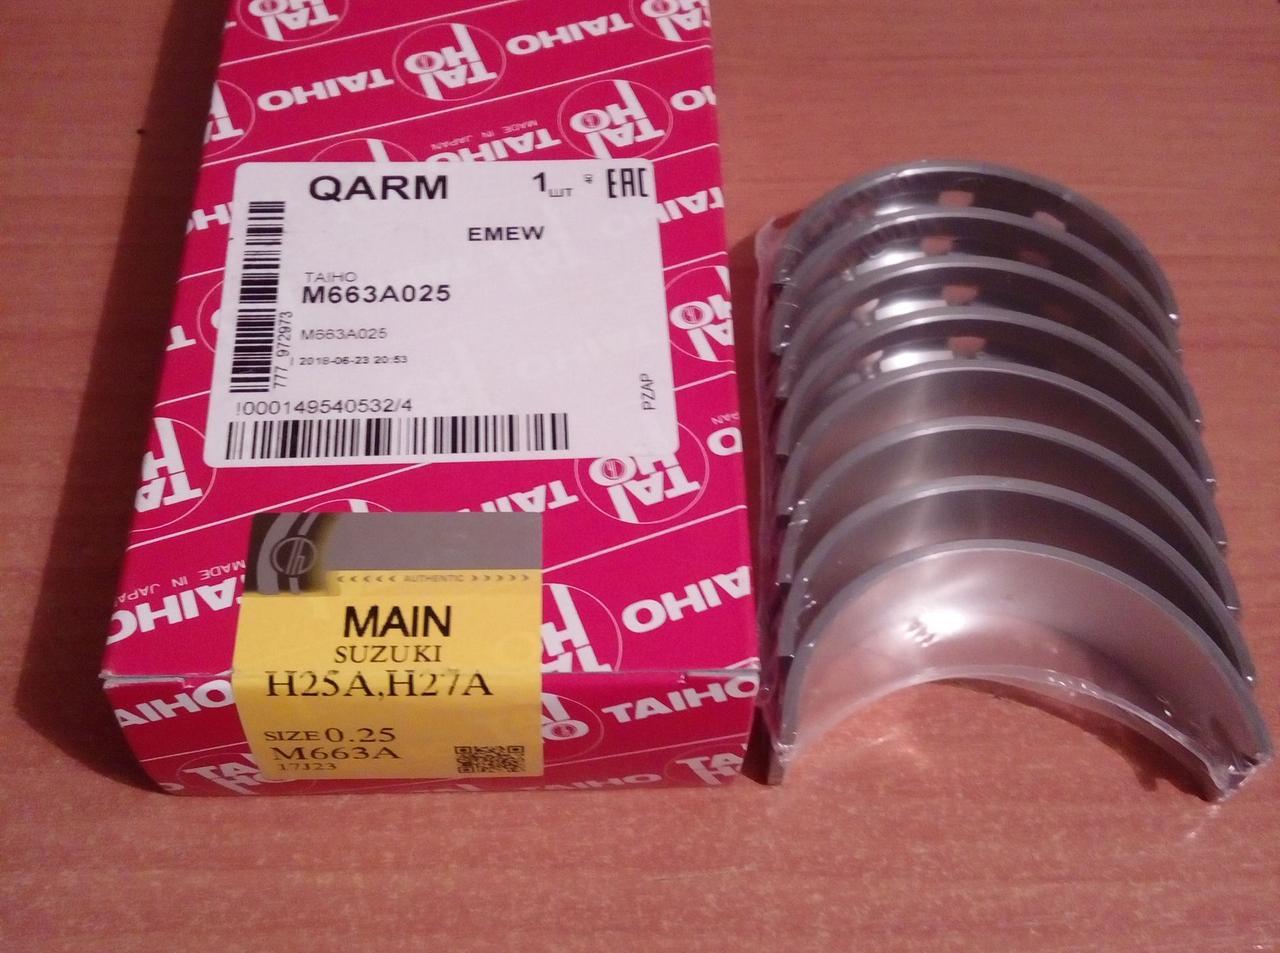 Вкладыши коренные 0,25 TAIHO M663A025 (12300-86812-0BA) комплект 4шт.